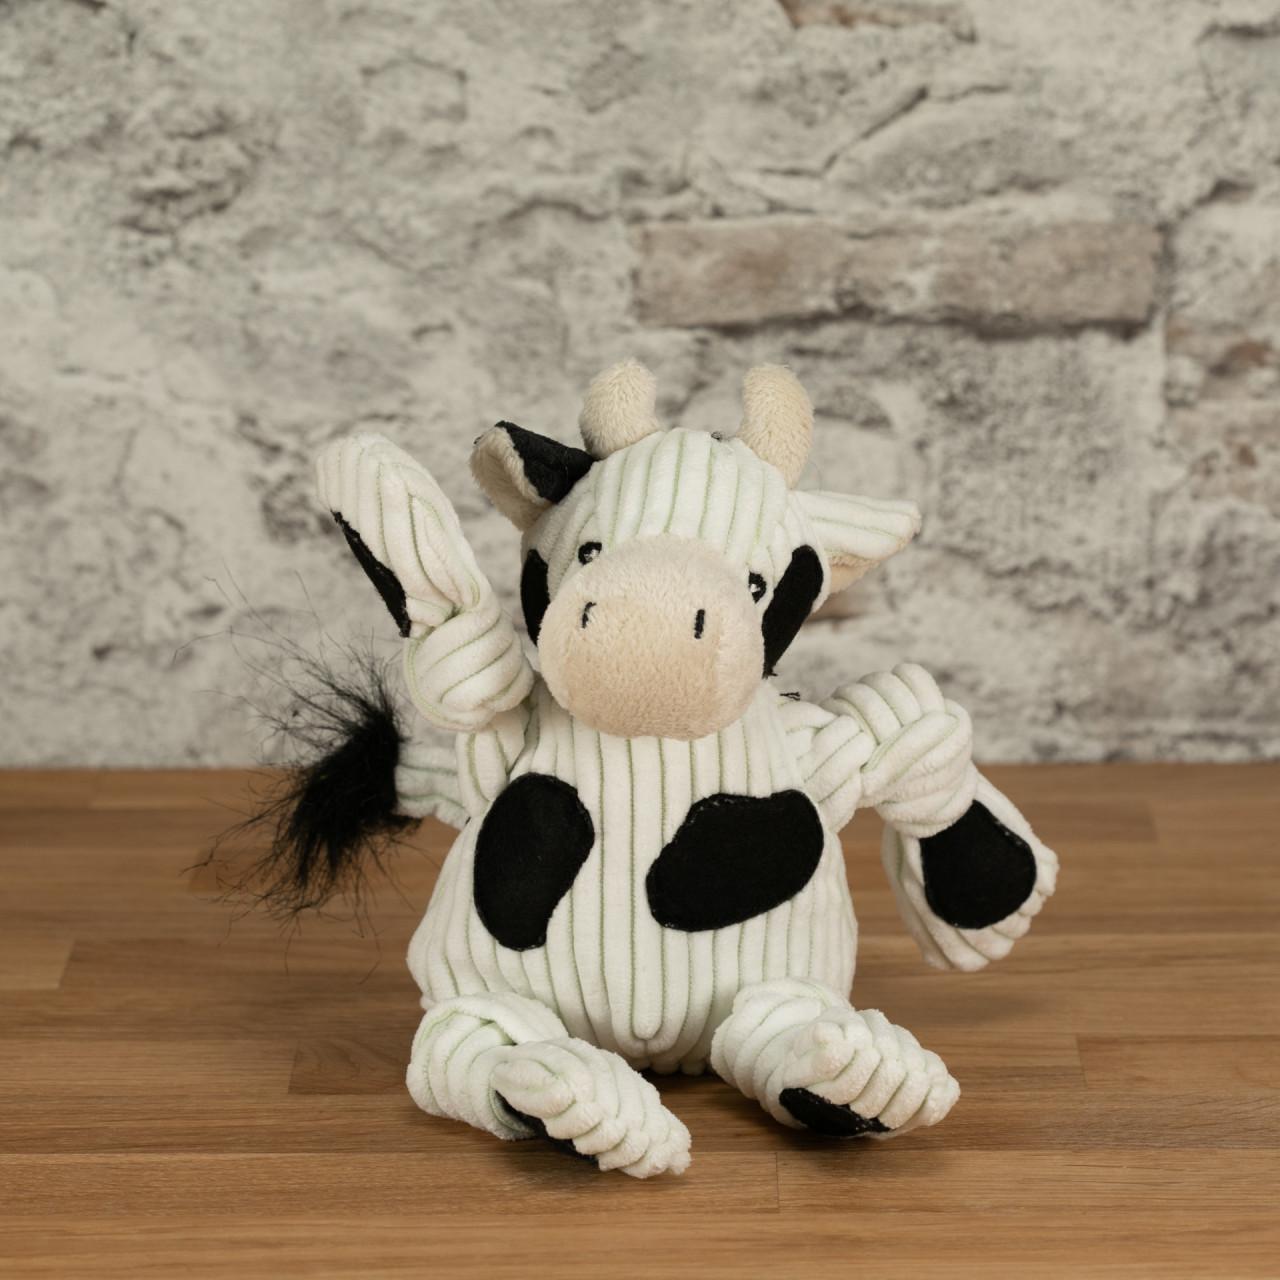 Hundespielzeug Die Kuh